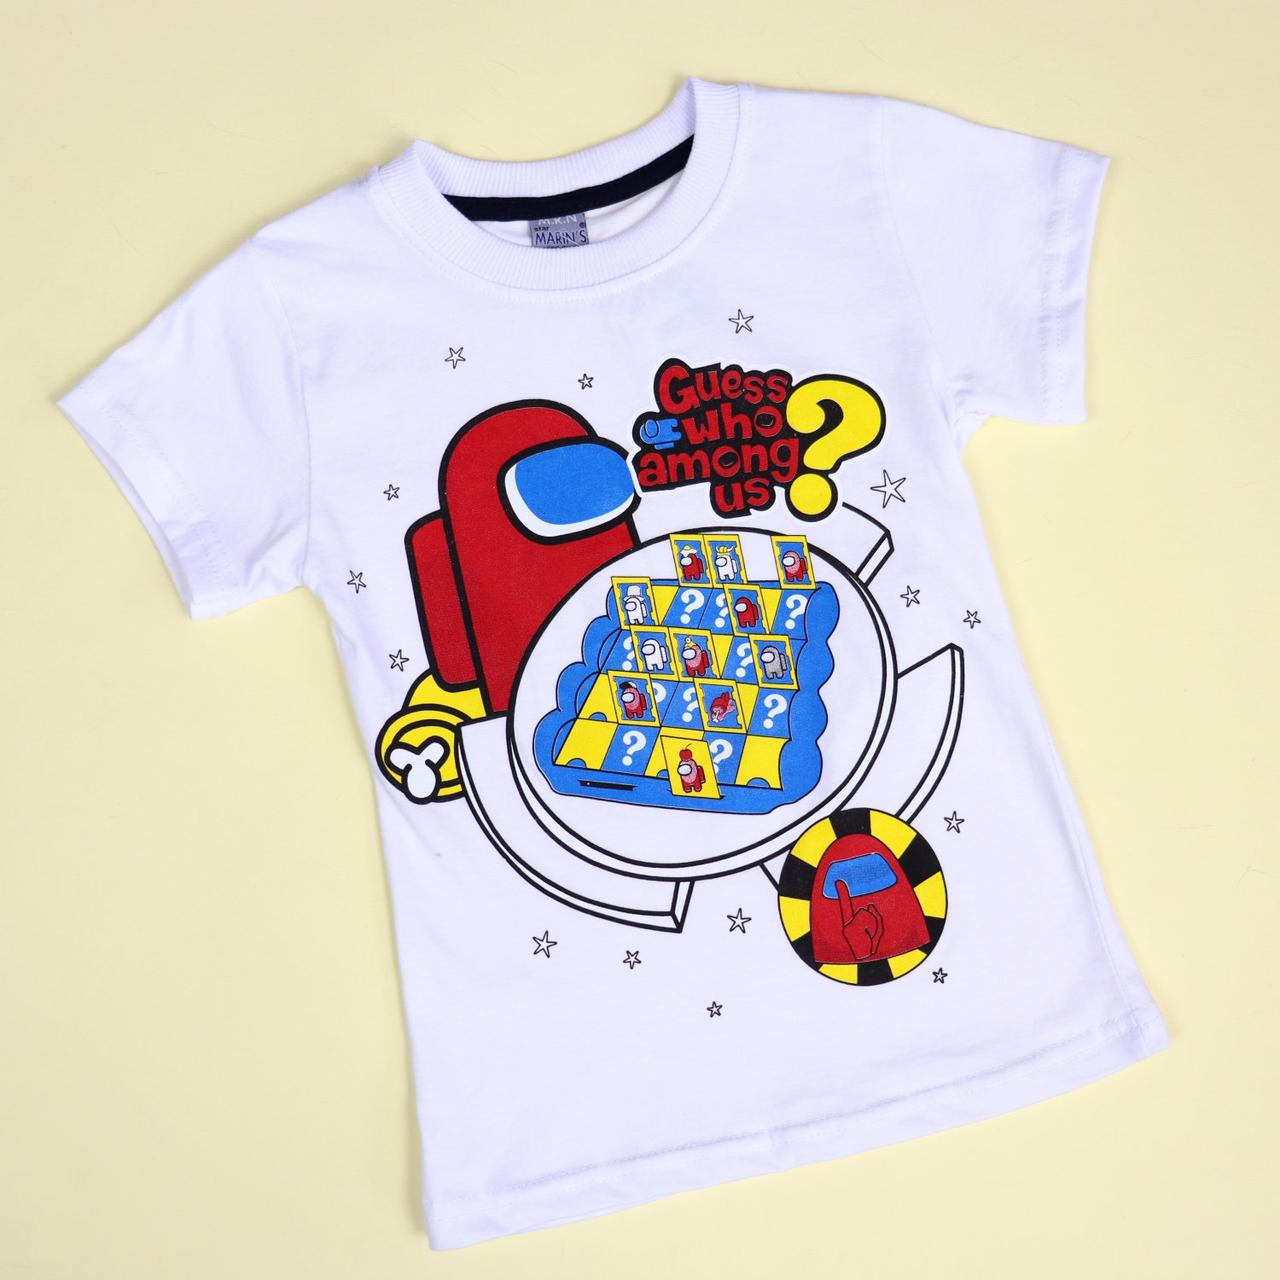 26890бел Белая футболка для мальчика AMONG US тм MARIN'S размер 5,6,8 лет